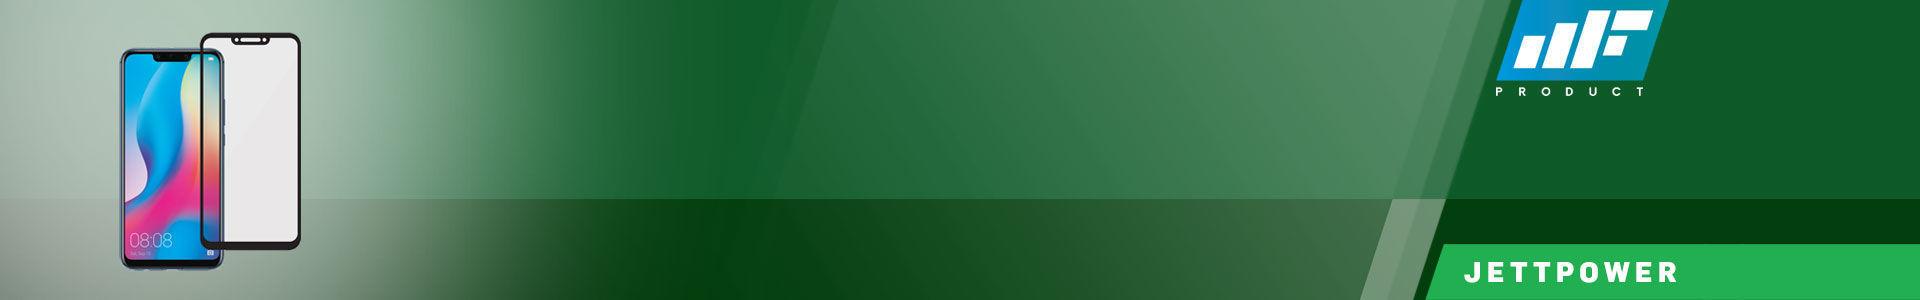 MF Product Jettpower 0437 Renklı Ekran Koruyucu Cam Huawei Mate 20 Lite hemen al, hemen gelsin!